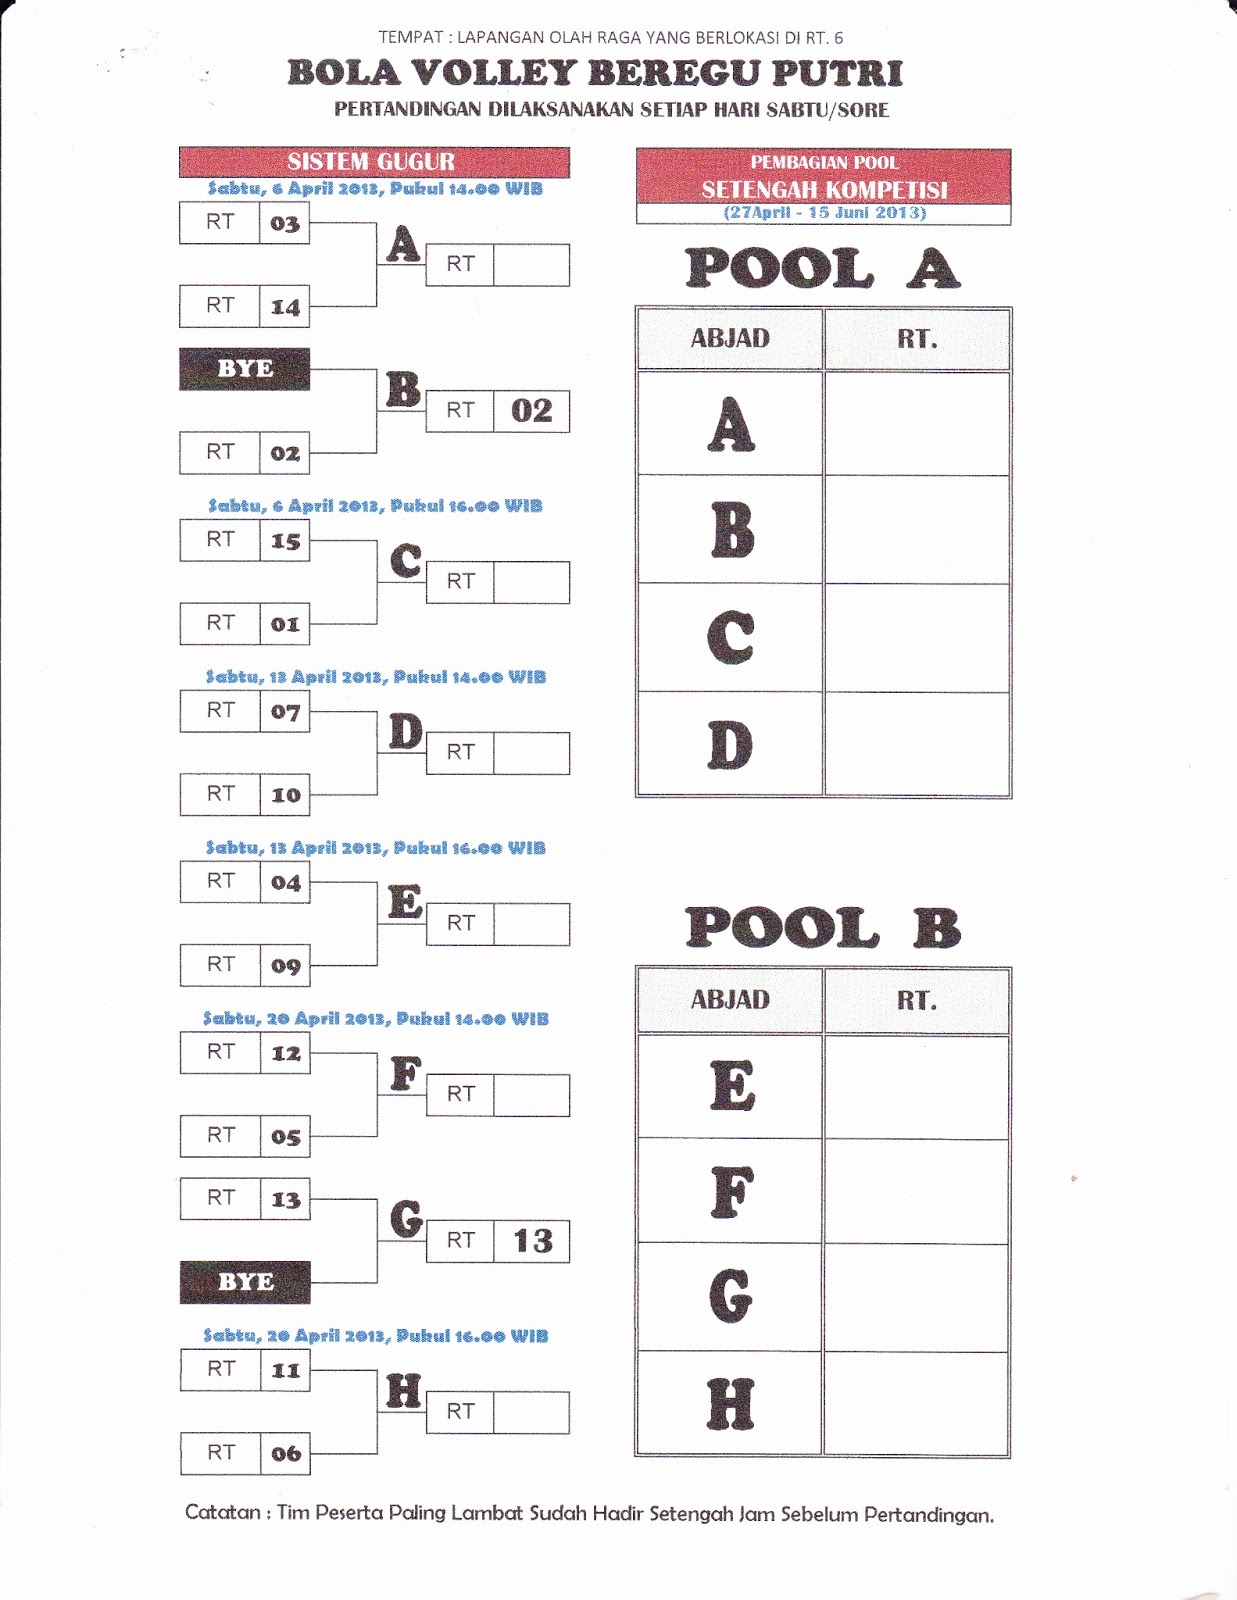 Jadwal Pertandingan Bola Volley Beregu Putri - Buletin RW 17